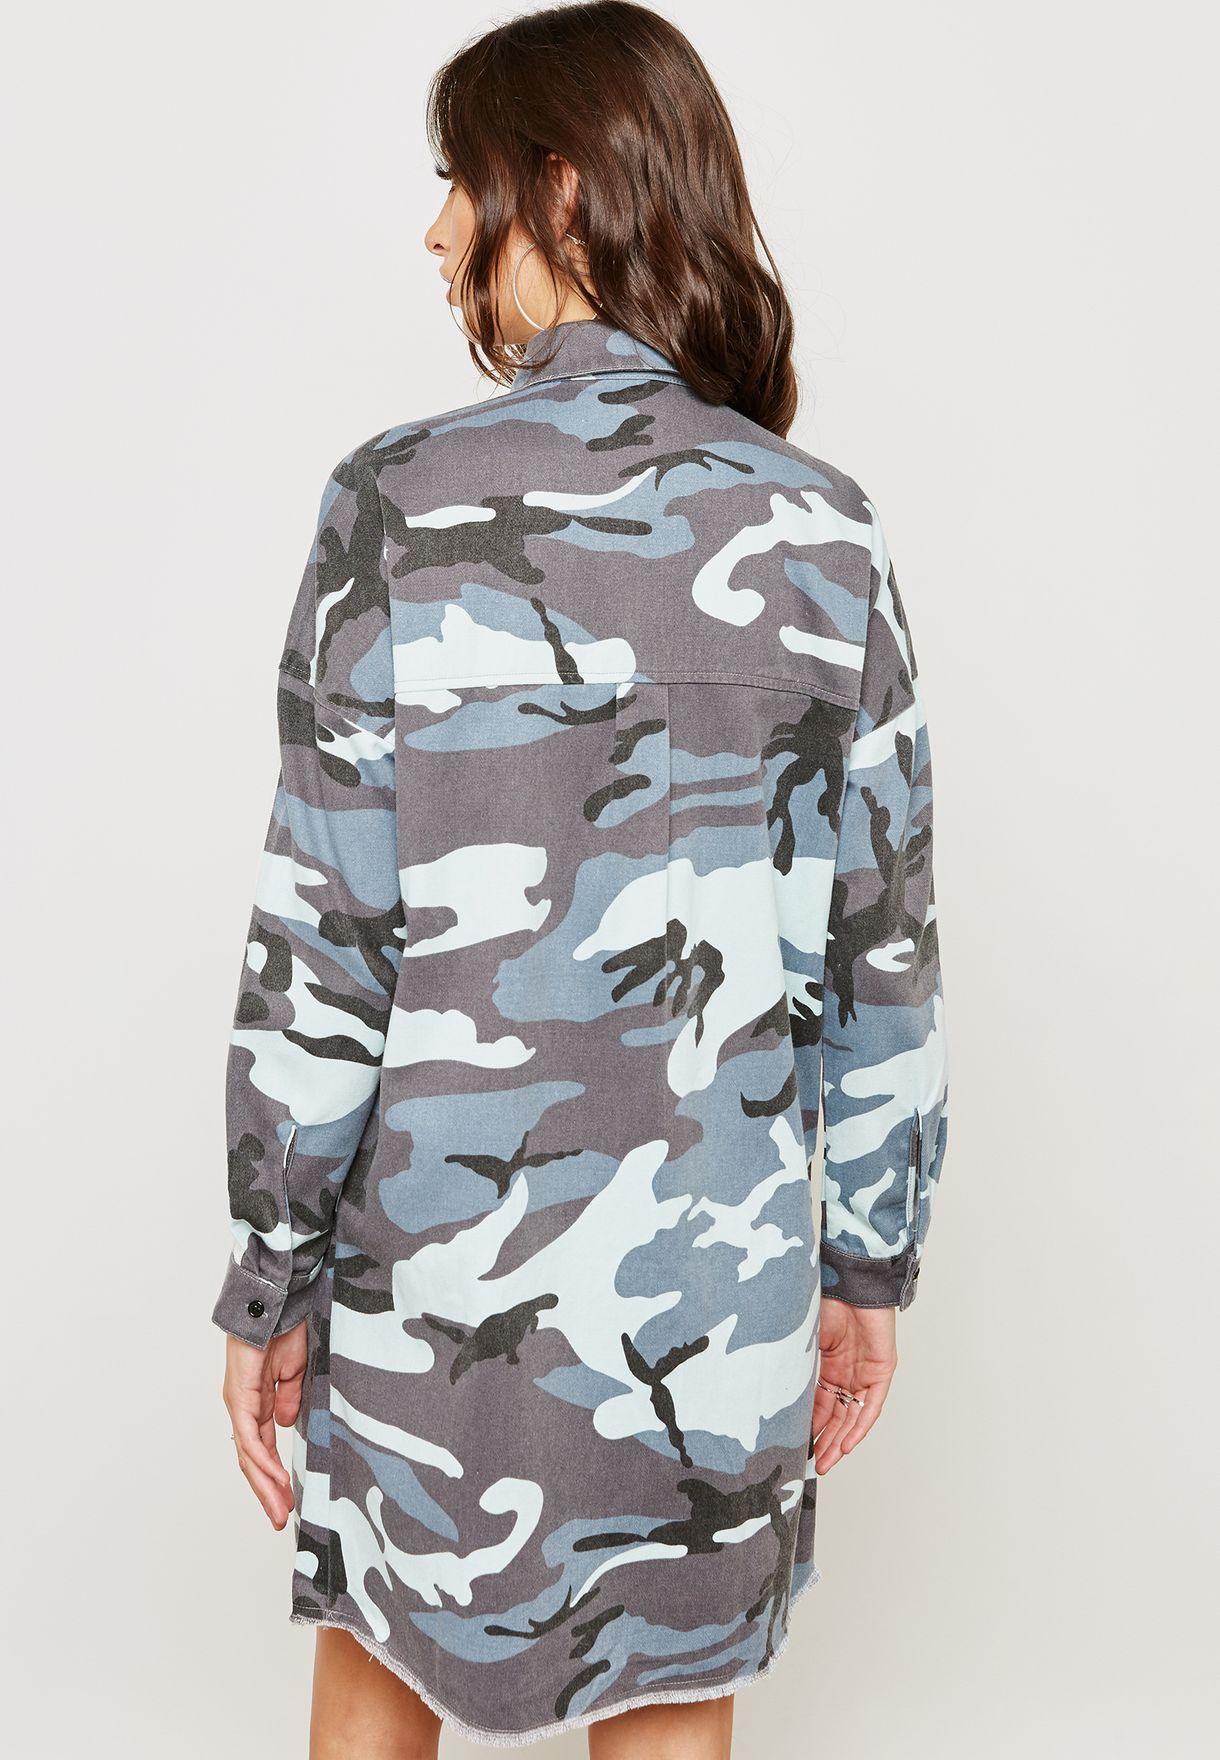 Camo Shirt Dress with Striped Sleeve Detail